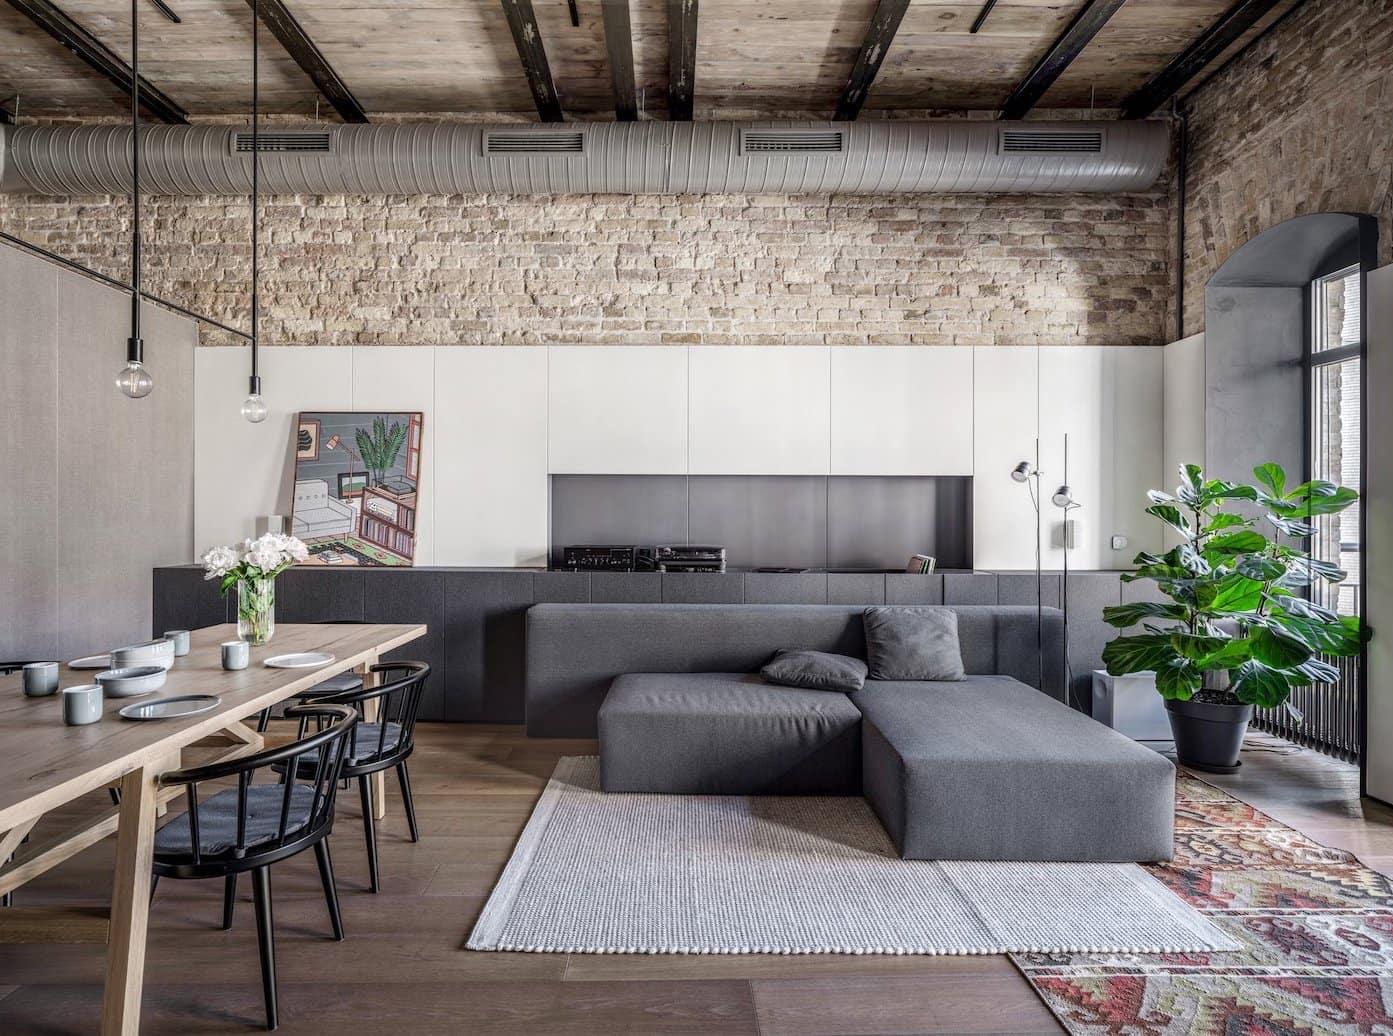 модный дизайн интерьера квартиры фото 39